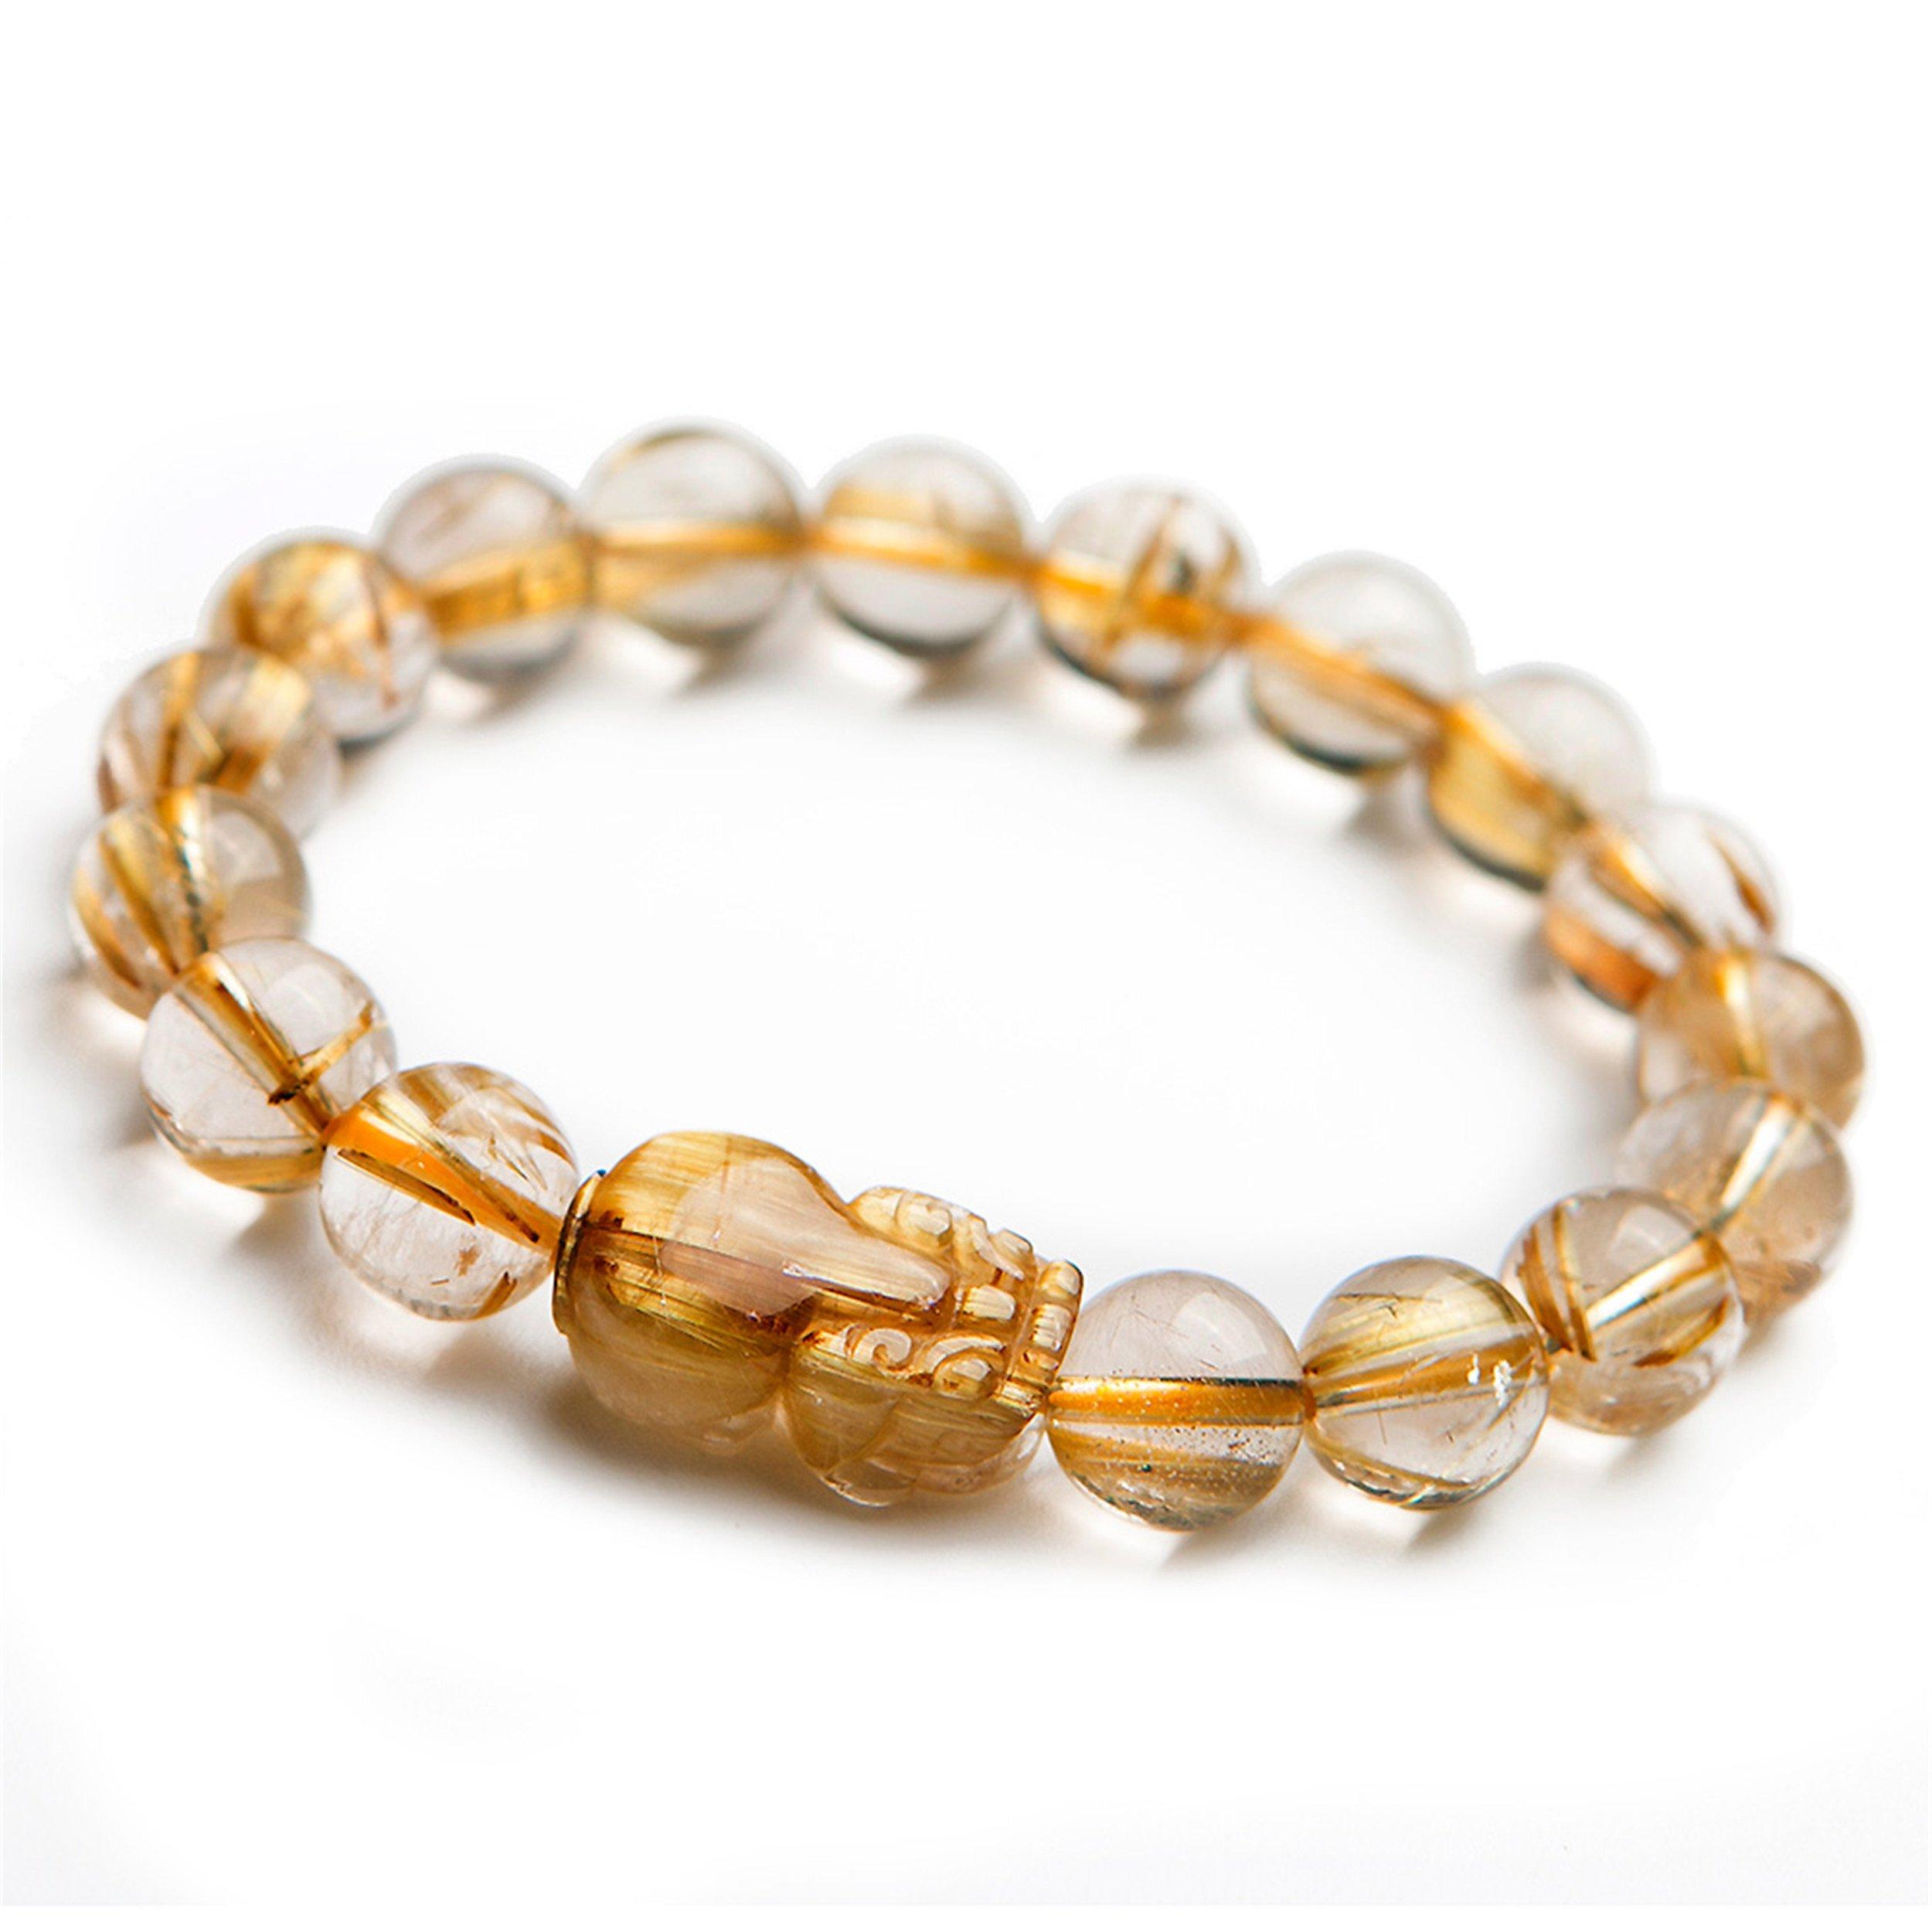 LiZiFang Genuine Natural Gold Rutilated Quartz Crystal Bracelets for Women Men Pixiu Round Bead Bracelet 11mm